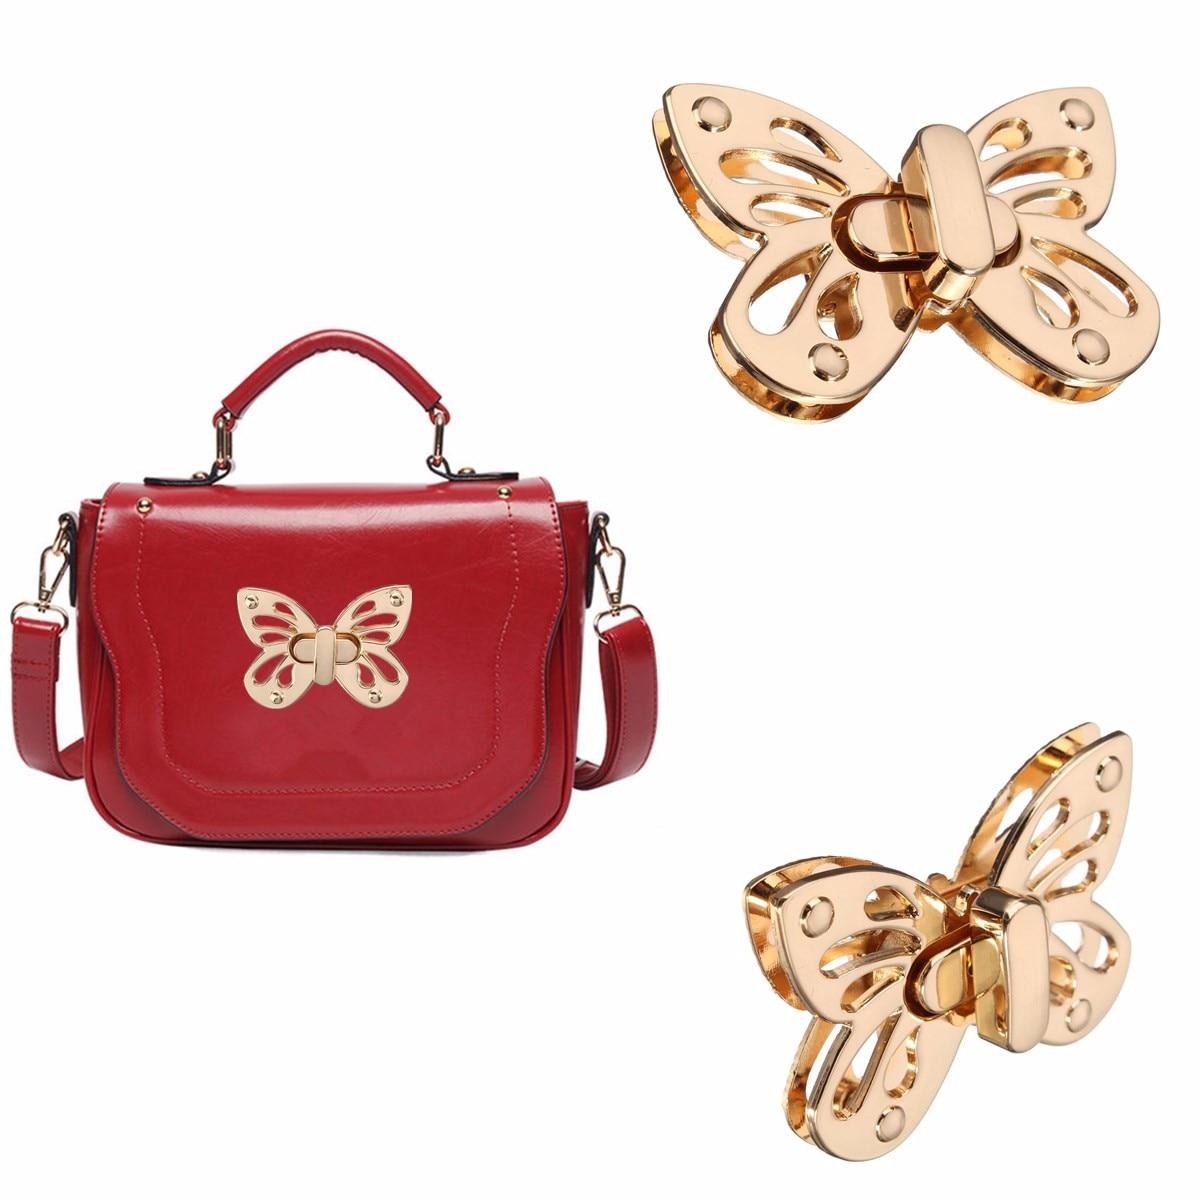 Osmond 3pcs Fashion Women Butterfly Tone Handbag Bag Accessories Purse Twist Turn Lock Snap Clasps/ Closure For Bag DIY Buckle